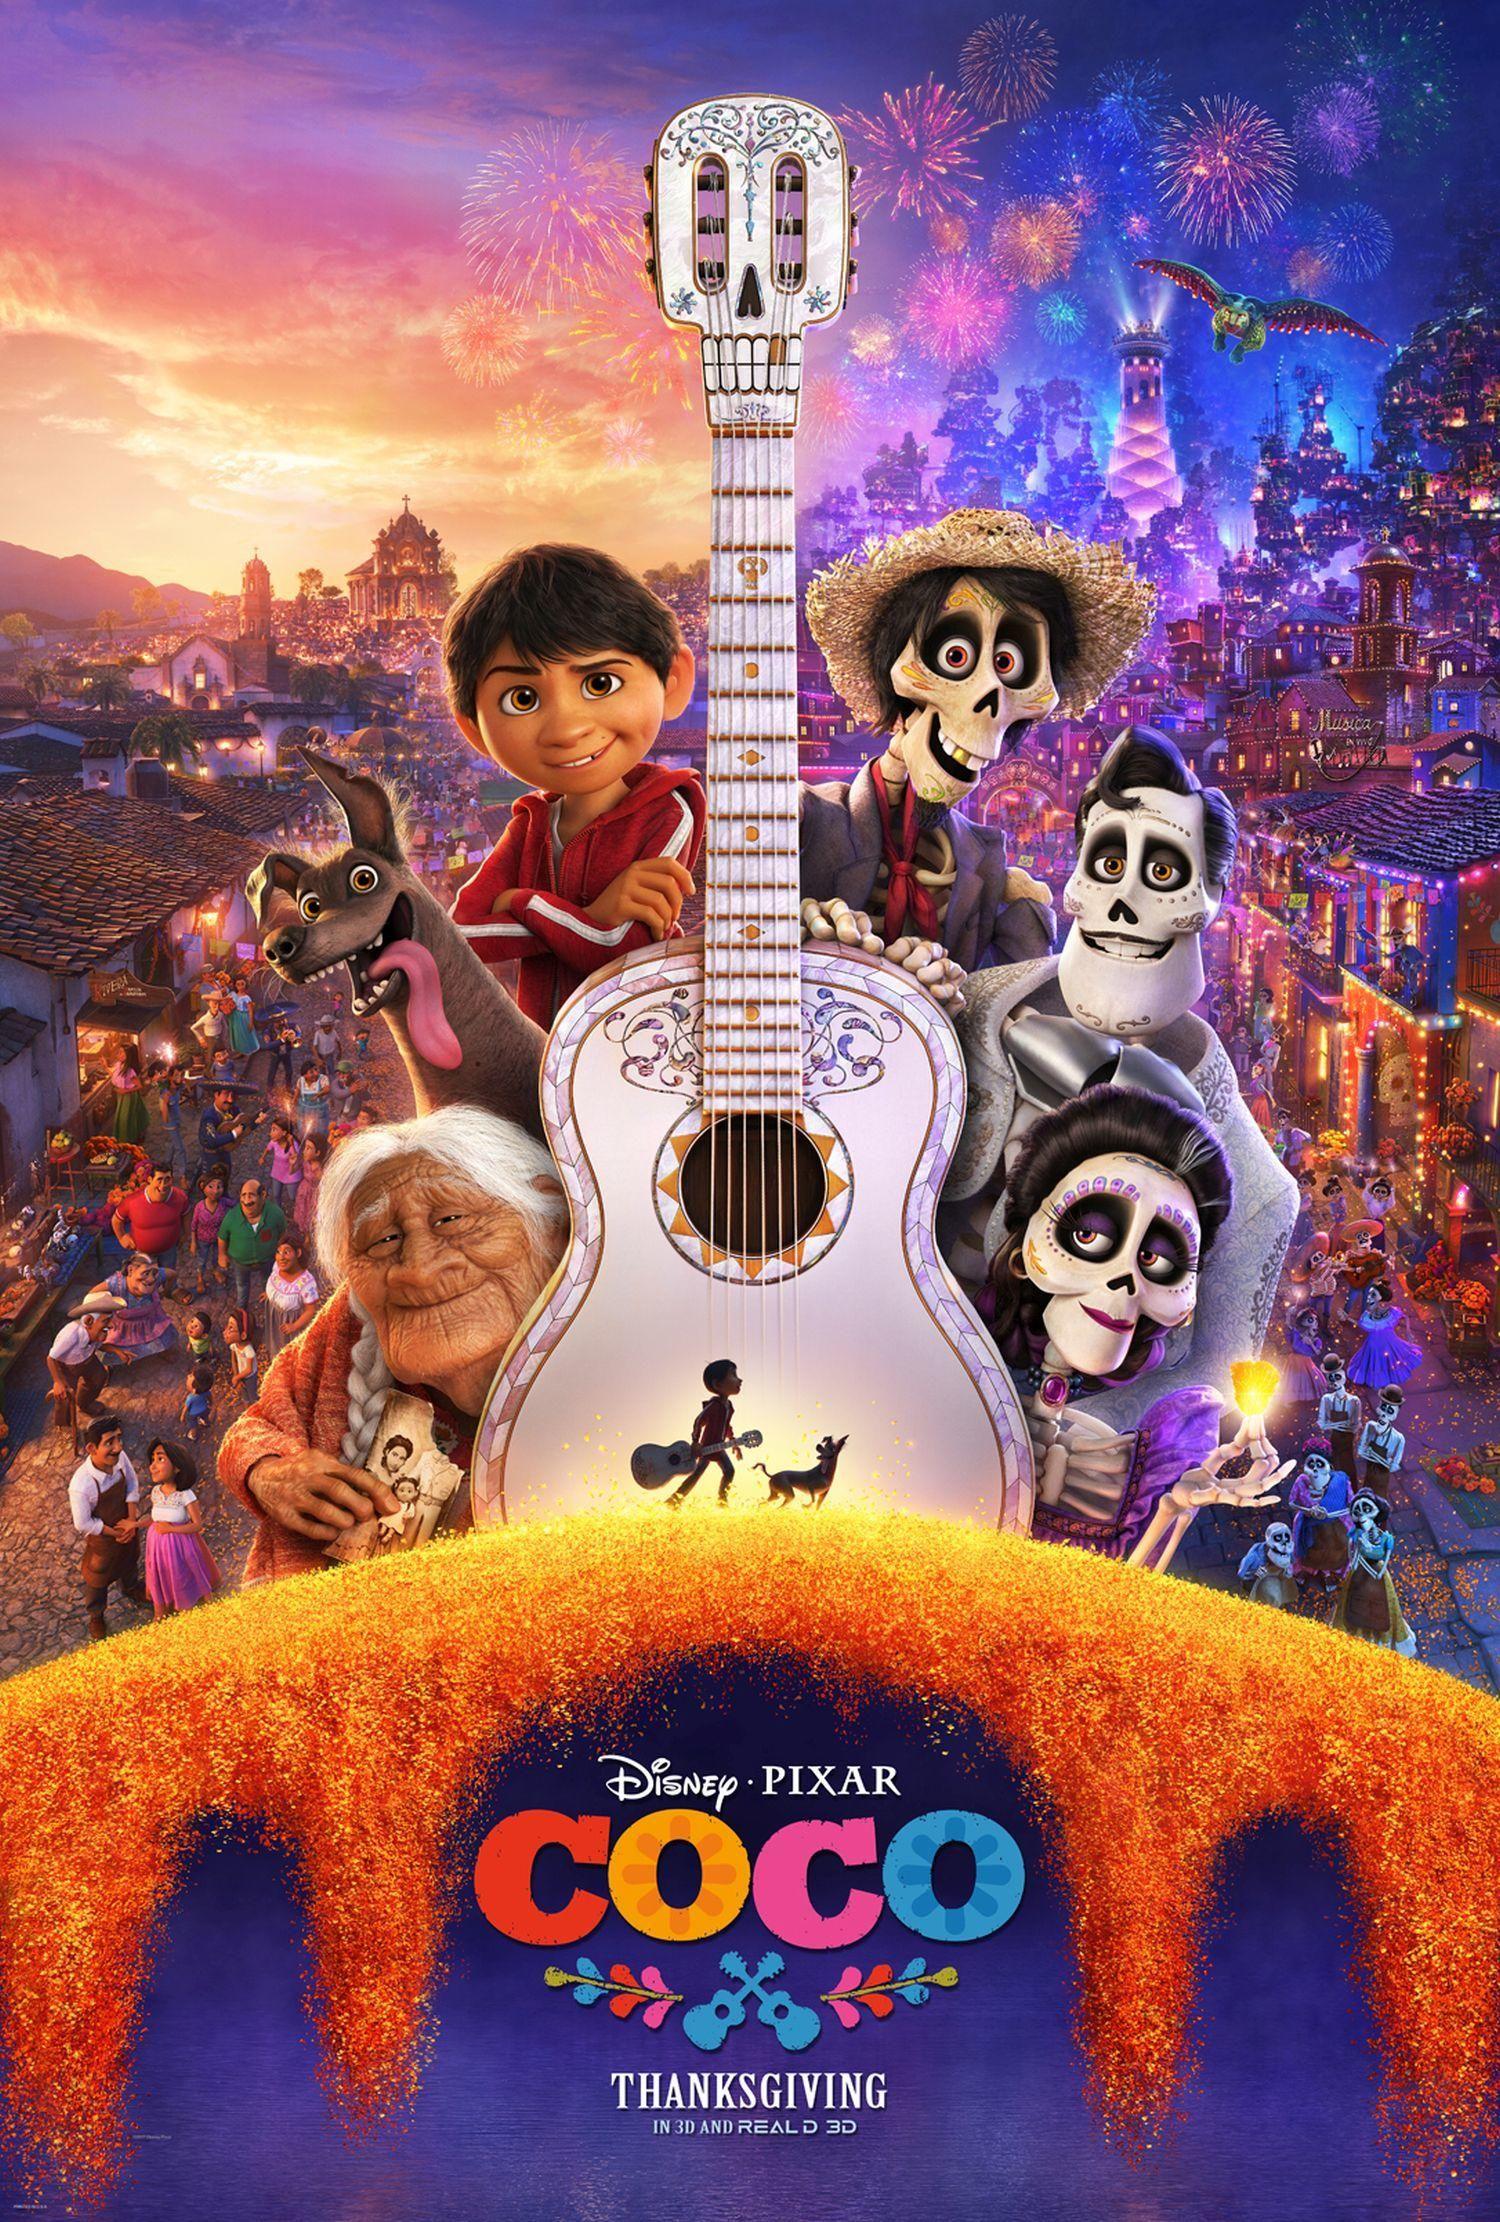 玩轉極樂園 Coco Disney Pixar фильмы мультфильмы и